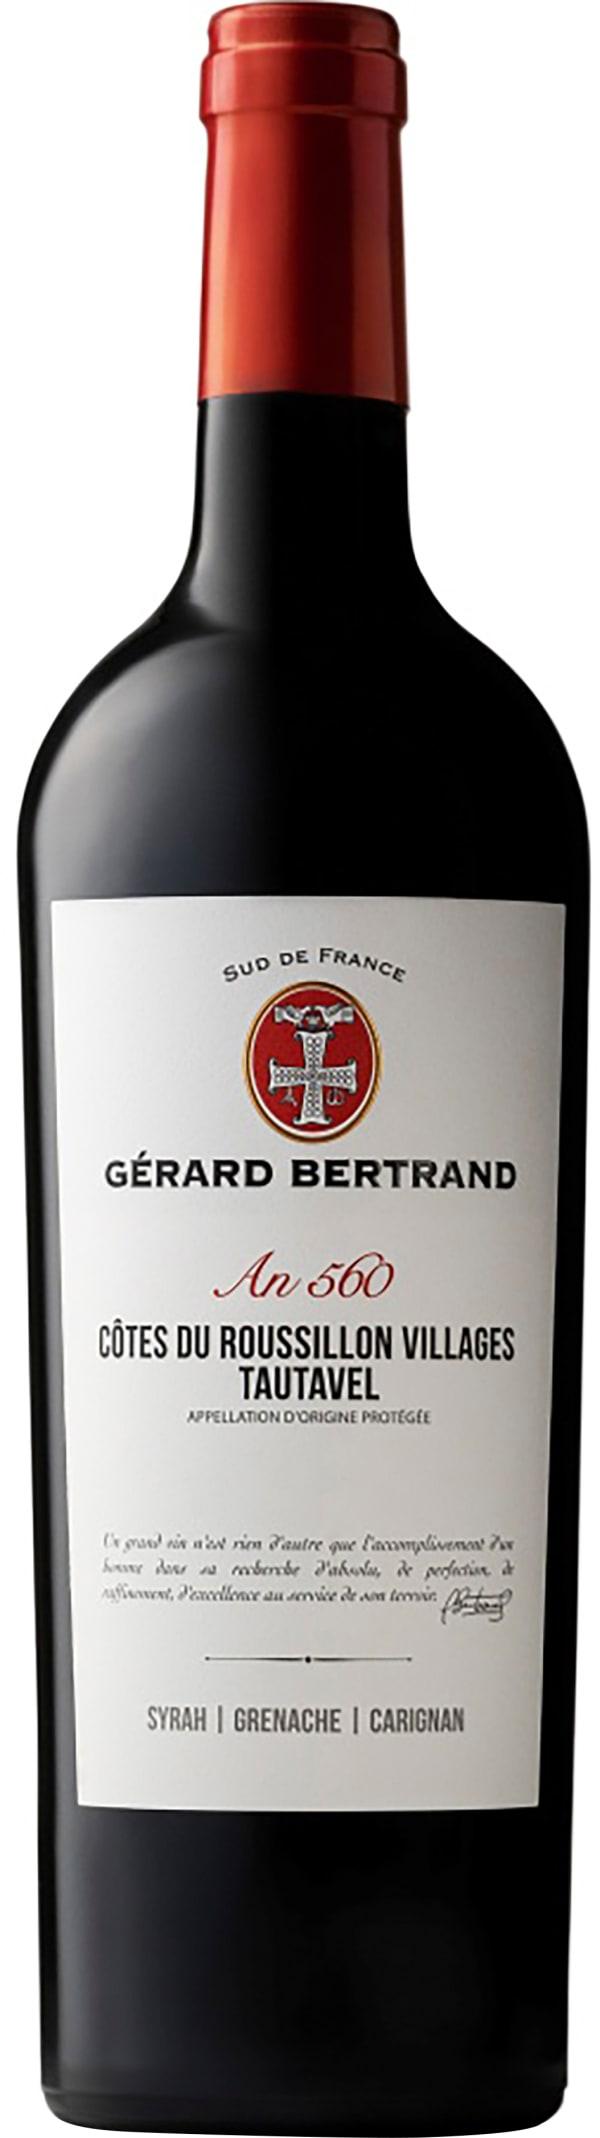 Gérard Bertrand Grand Terroir Tautavel 2015